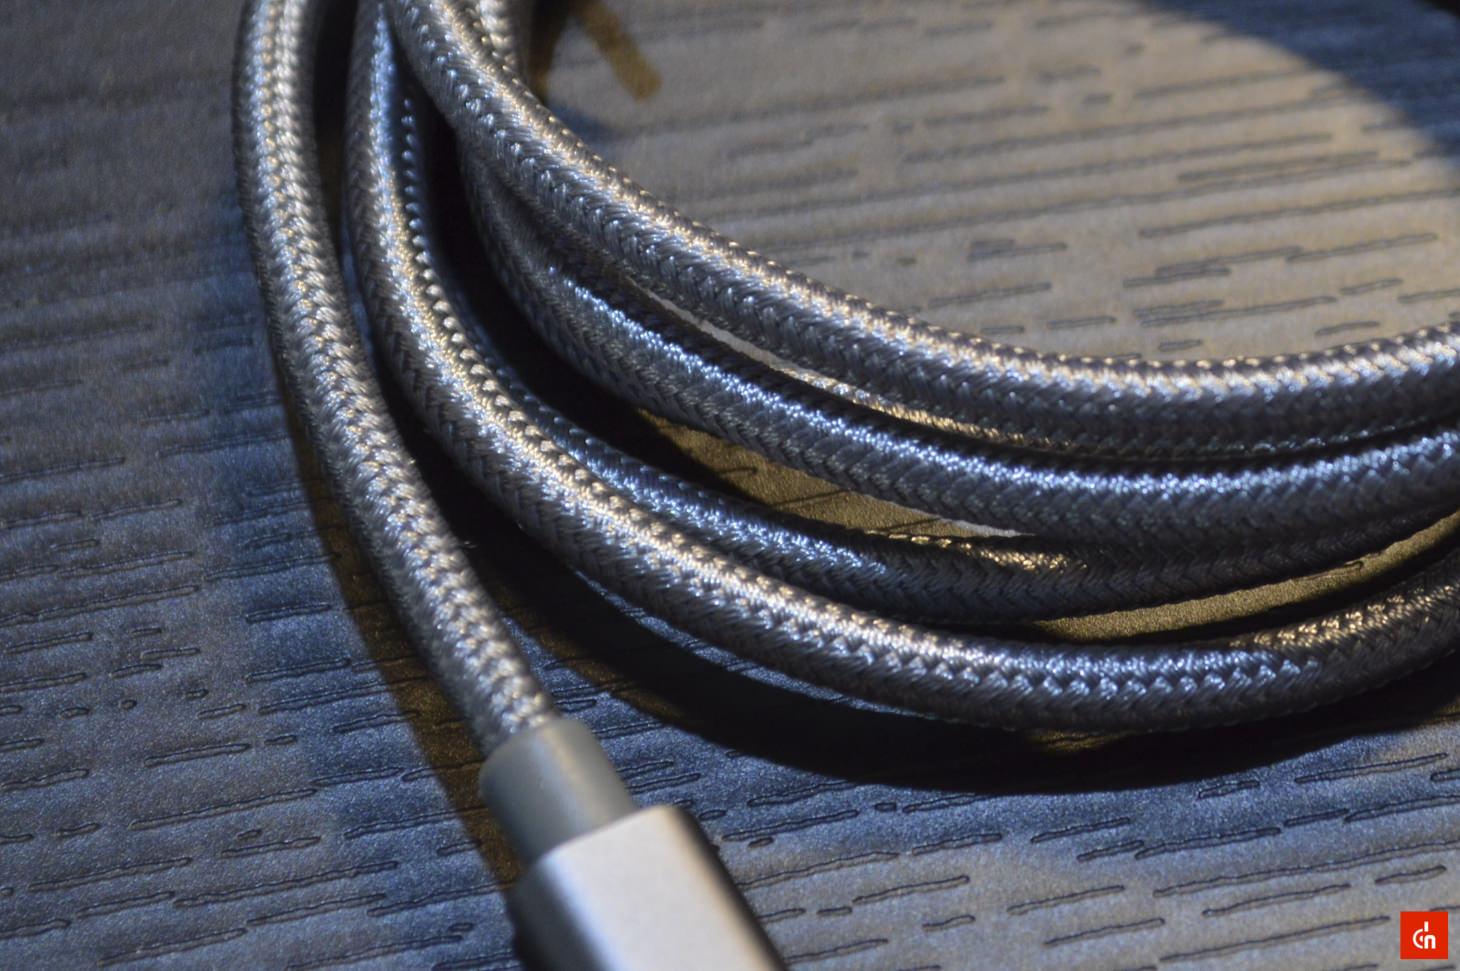 004_20160605_Lightning-cable-omaker